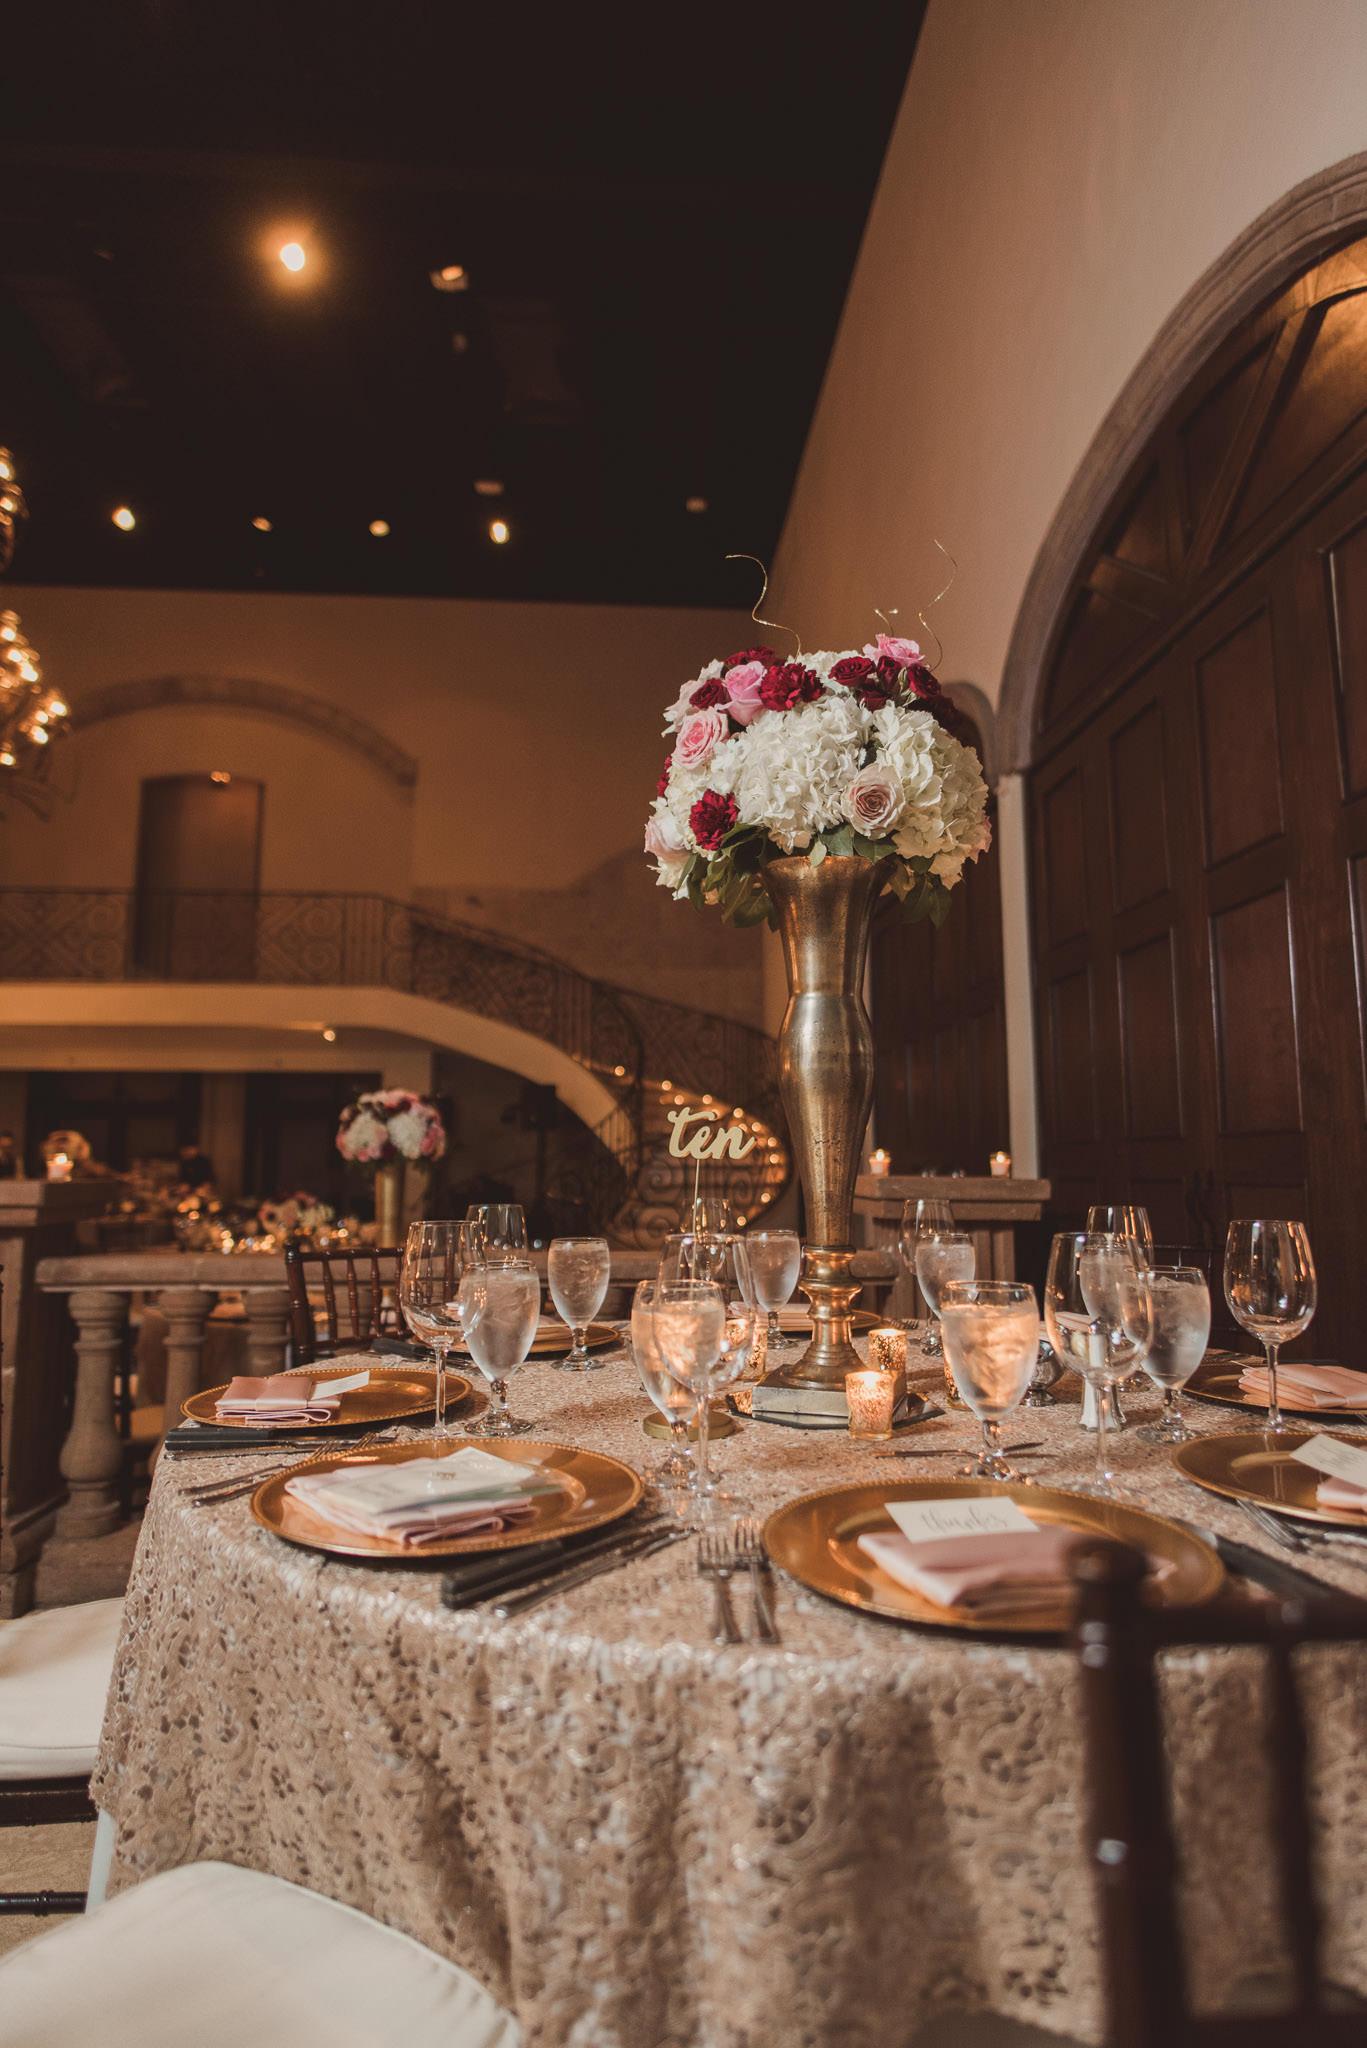 Bell-tower-34th-houston-wedding-venue-modern-luxury-photographer